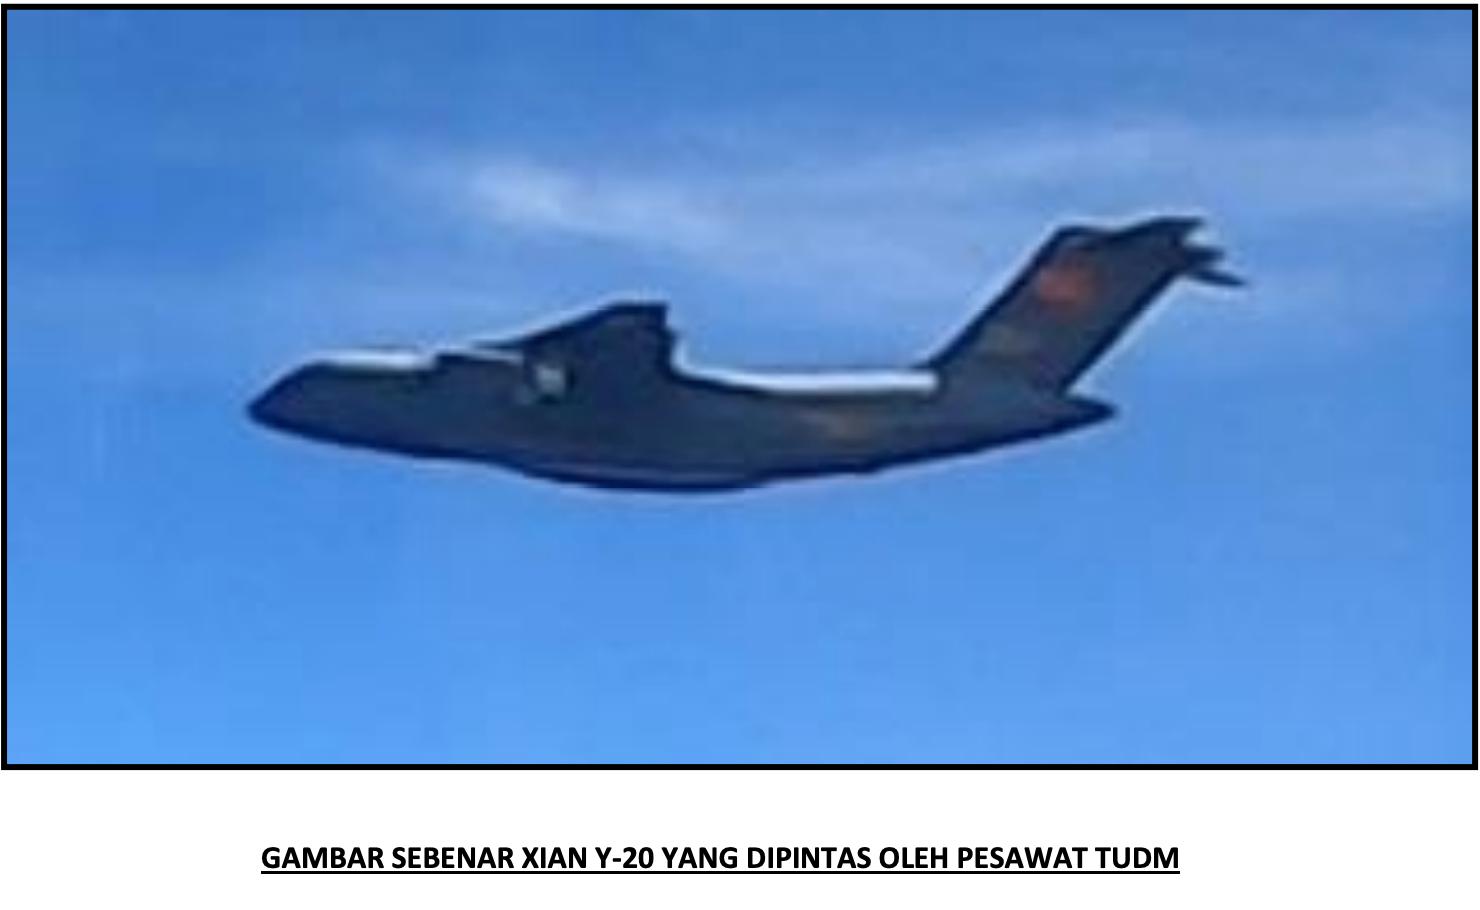 16 Pesawat Mencurigakan Milik Tentera Udara China Dikesan Masuk Ke Ruang Udara Malaysia 4